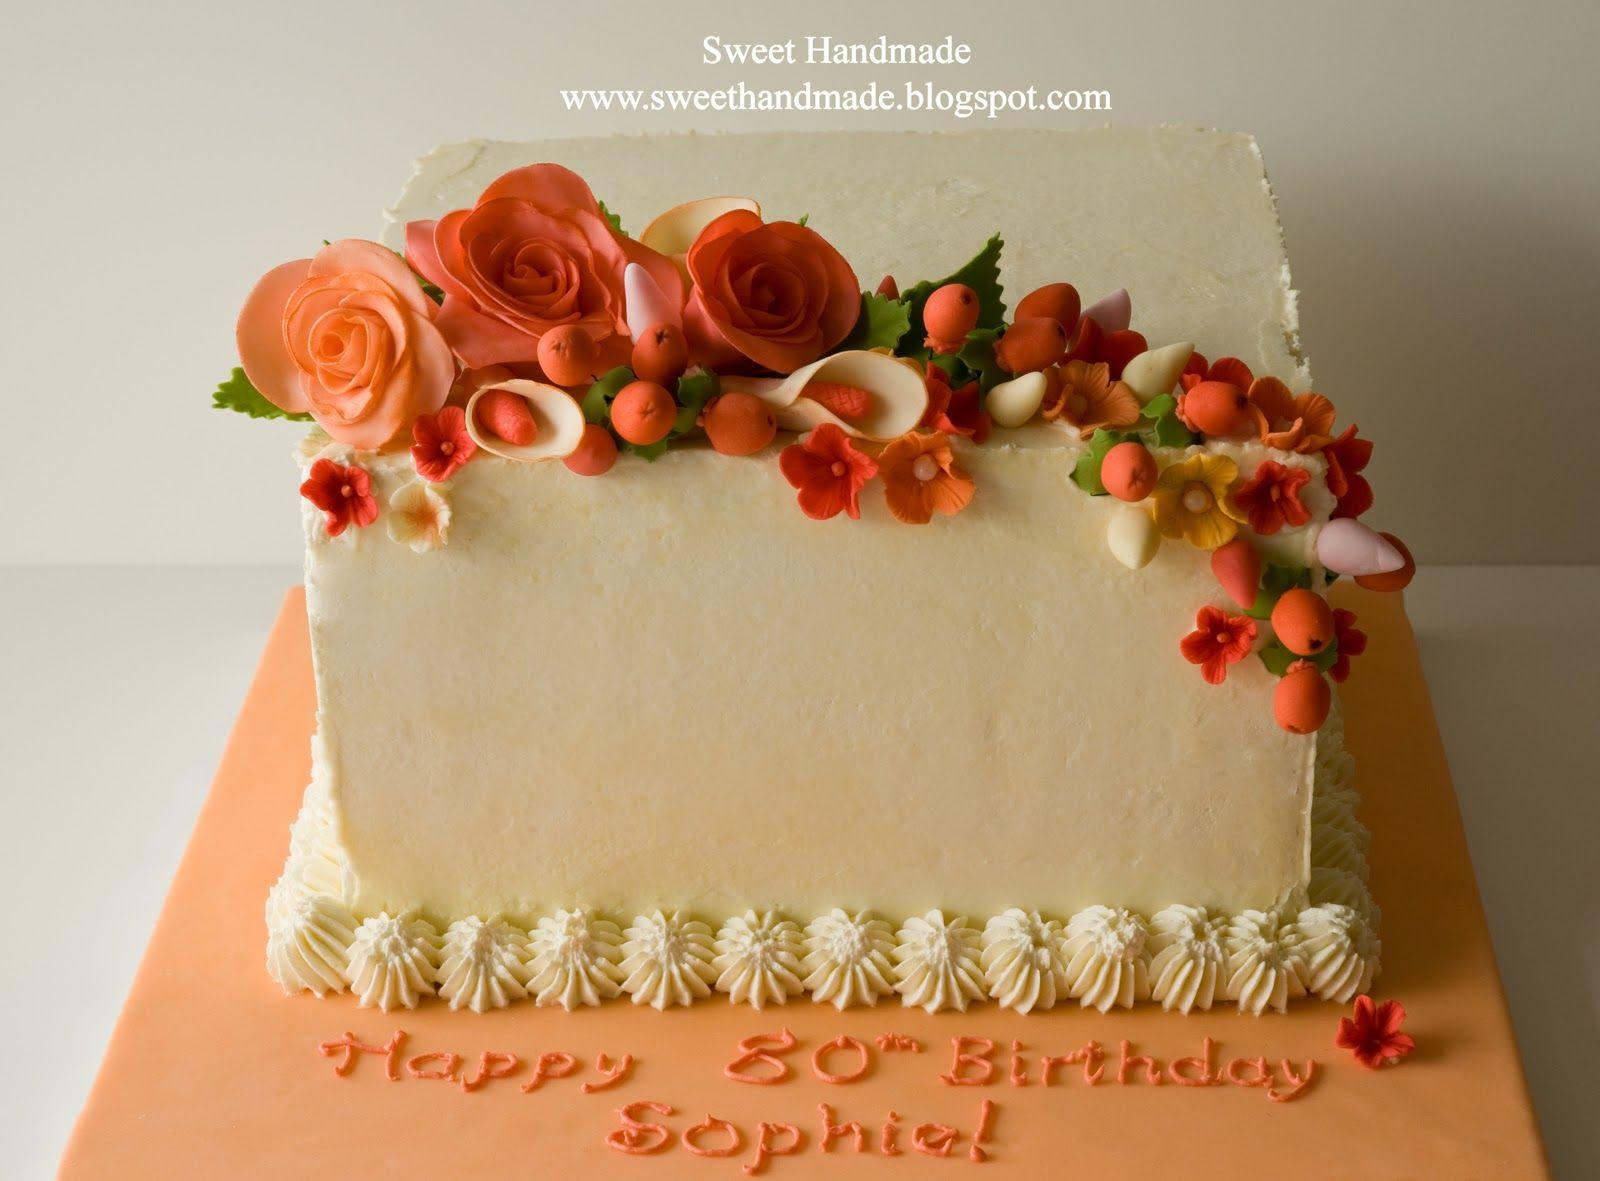 80th birthday ideas for her 80th birthday cake with gum paste 80th birthday ideas for her 80th birthday cake with gum paste flowers izmirmasajfo